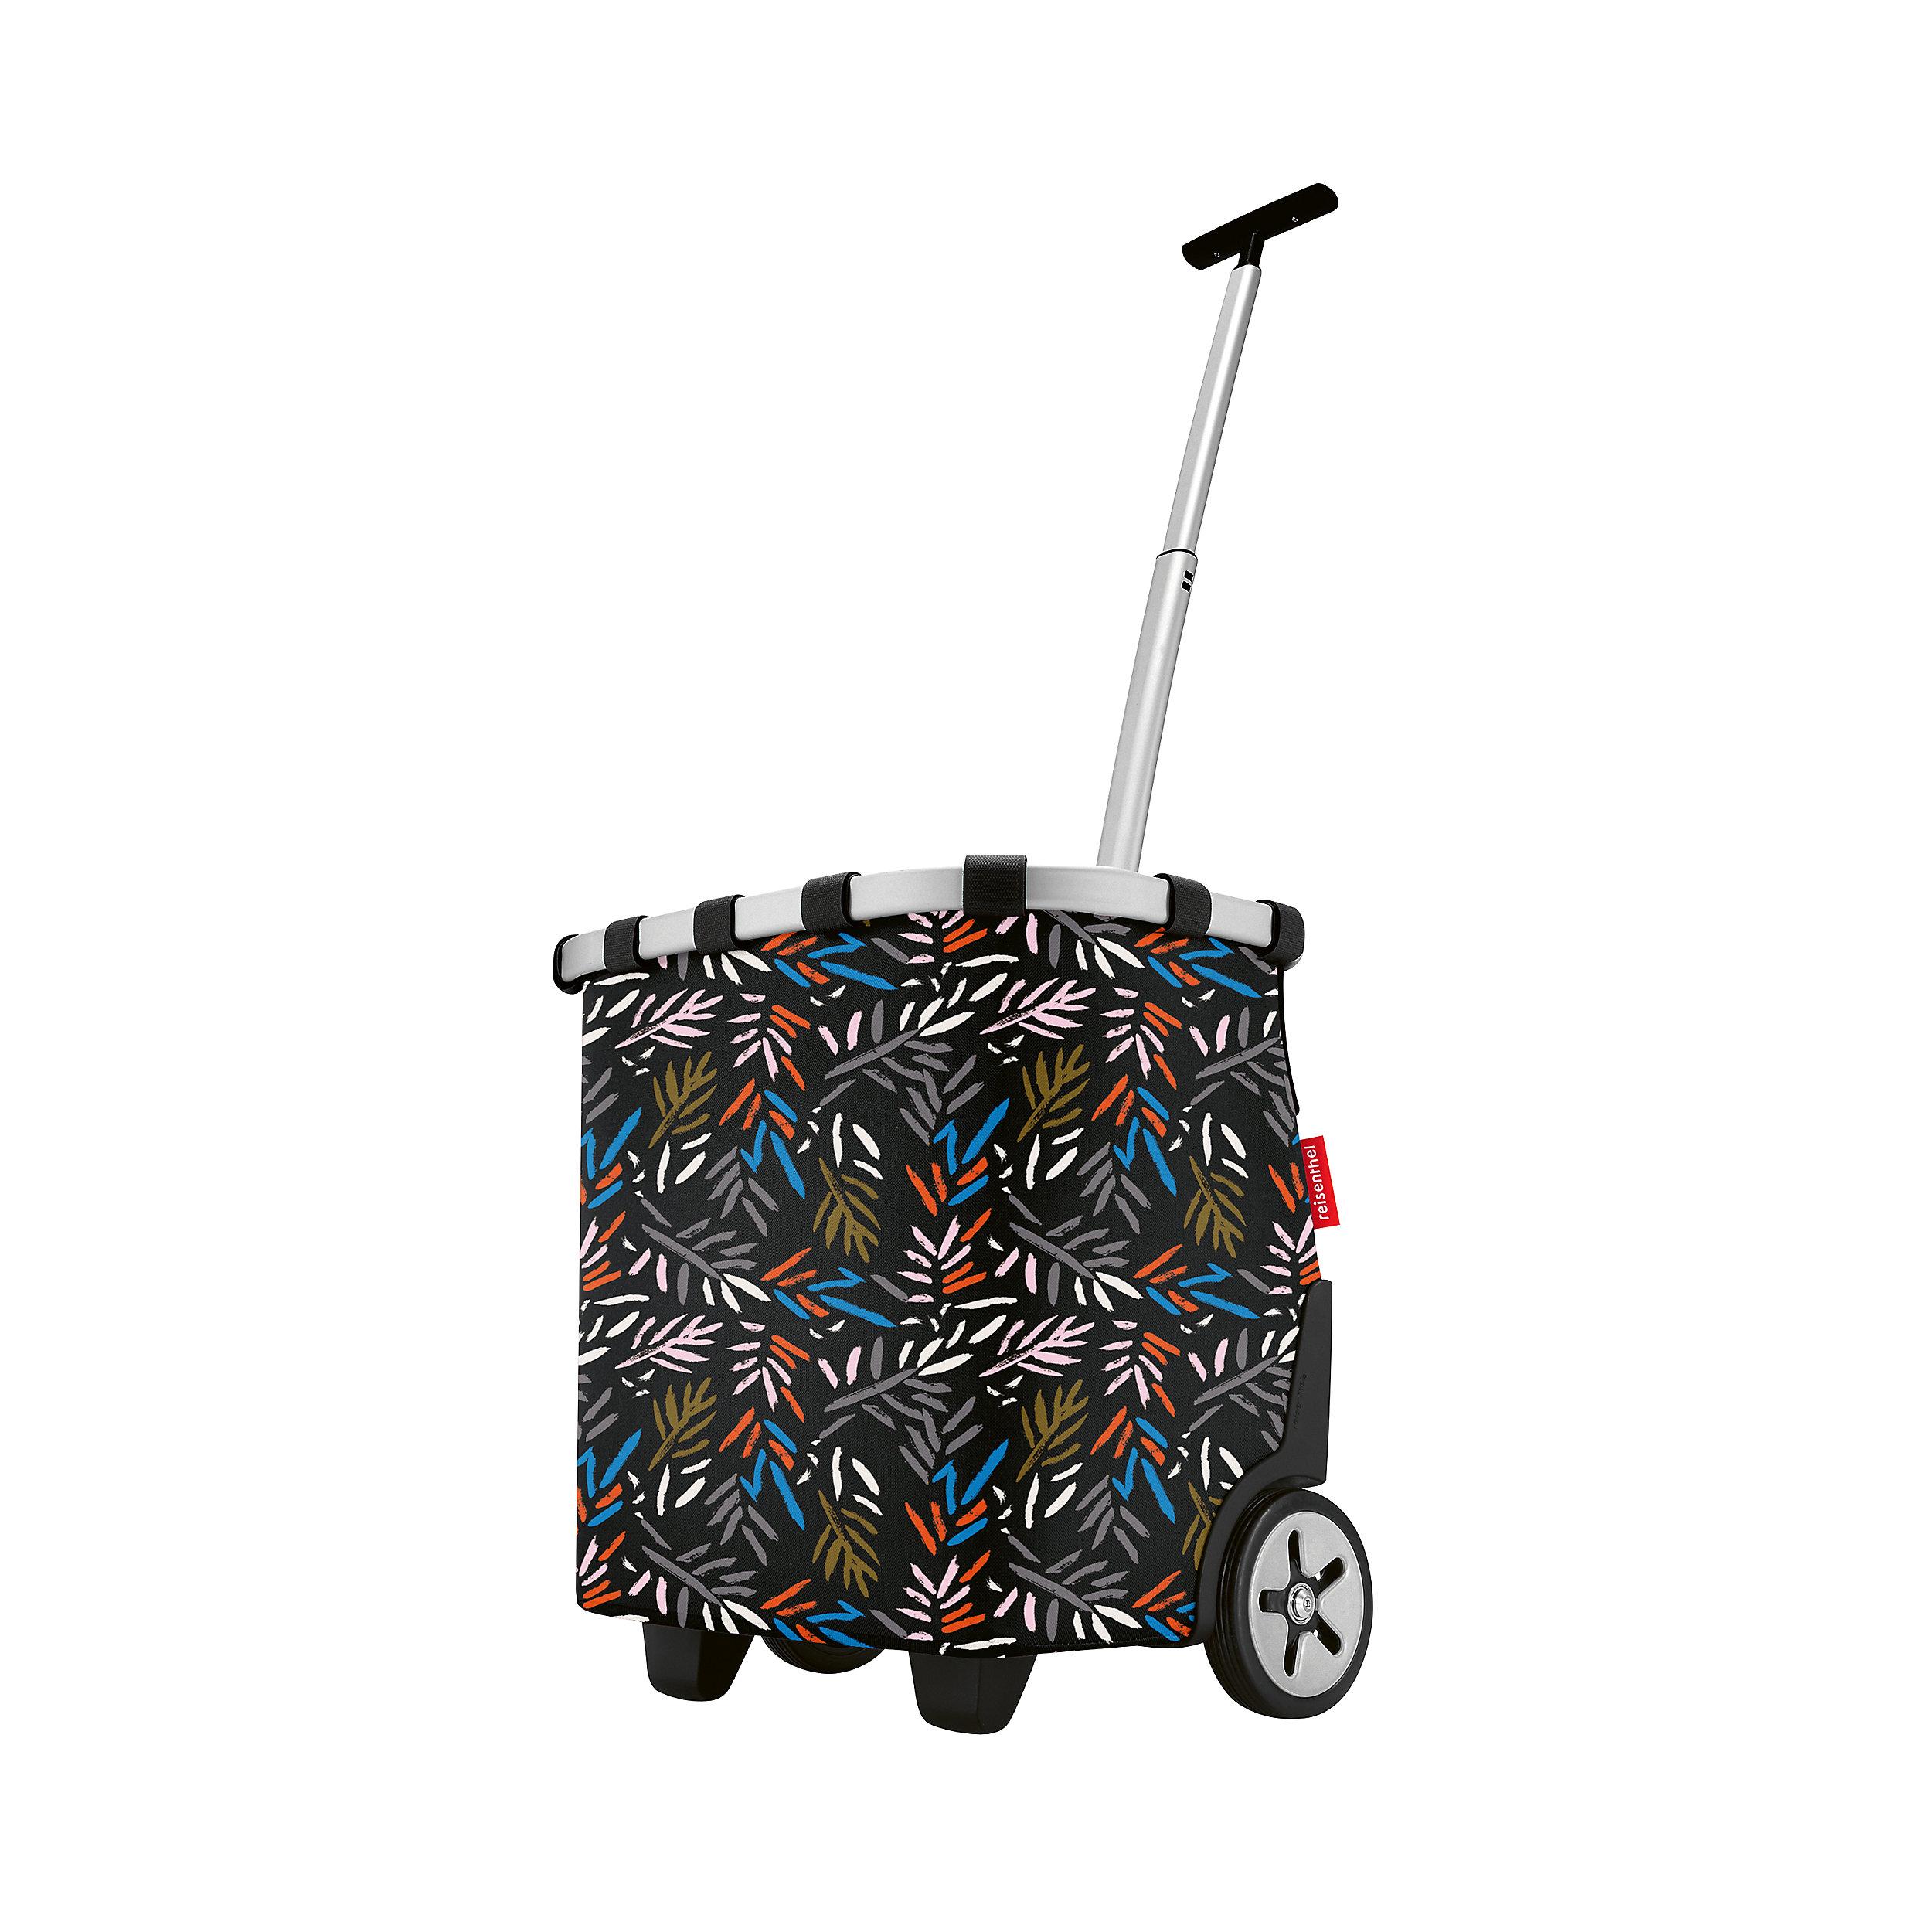 Carrycruiser with 2 wheels Shopping 40 Liter